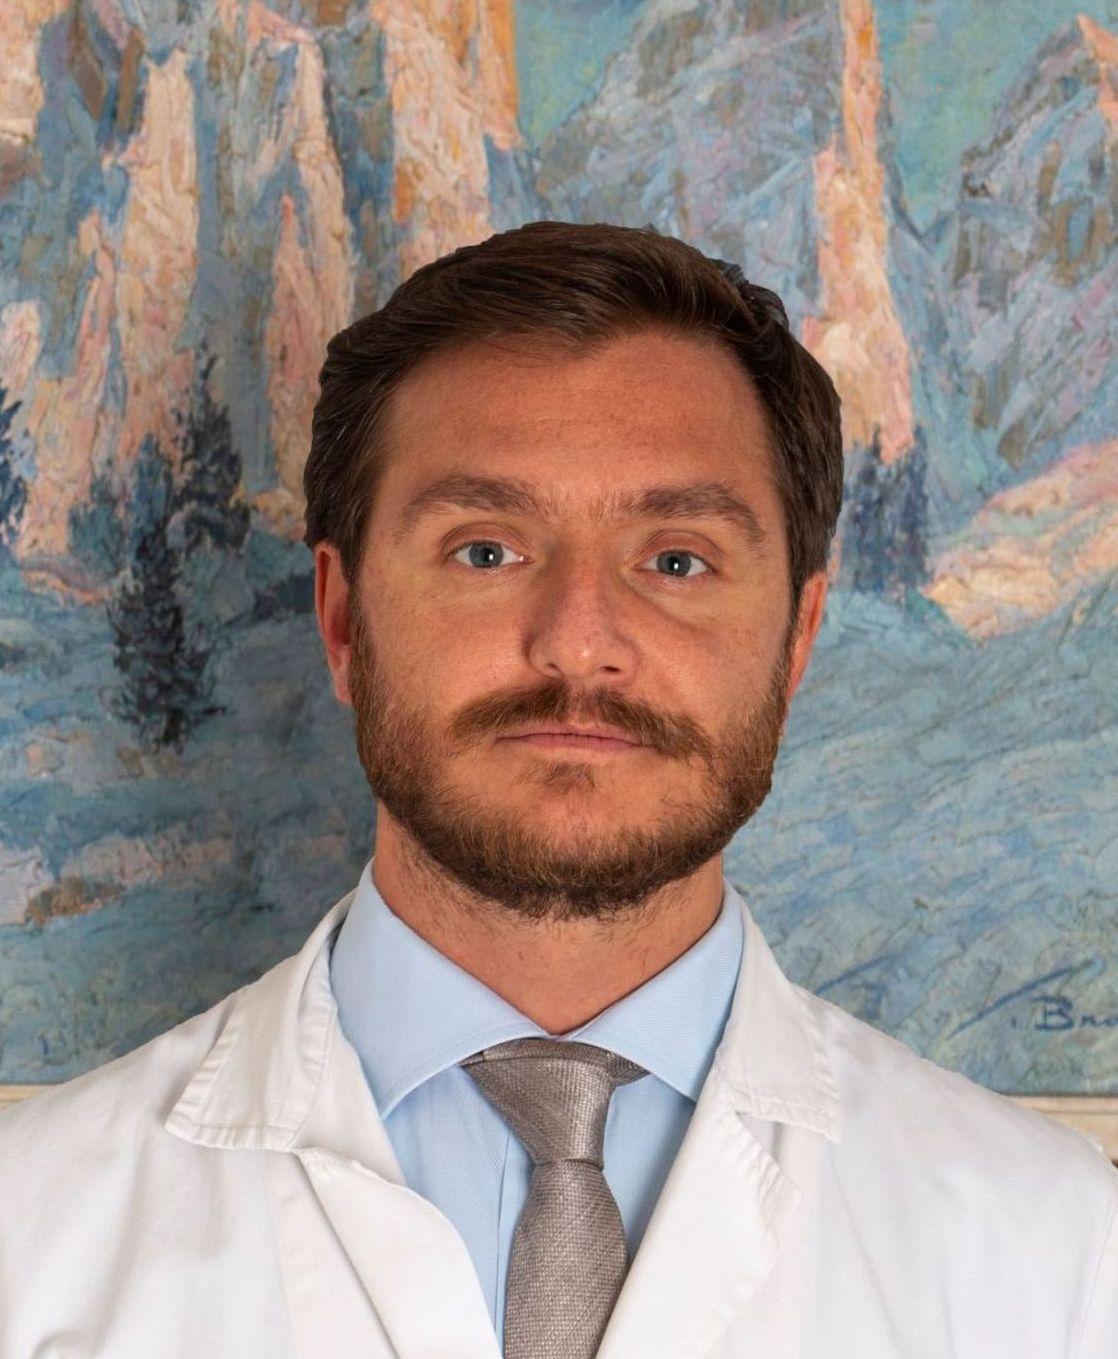 Mauro Agnifili